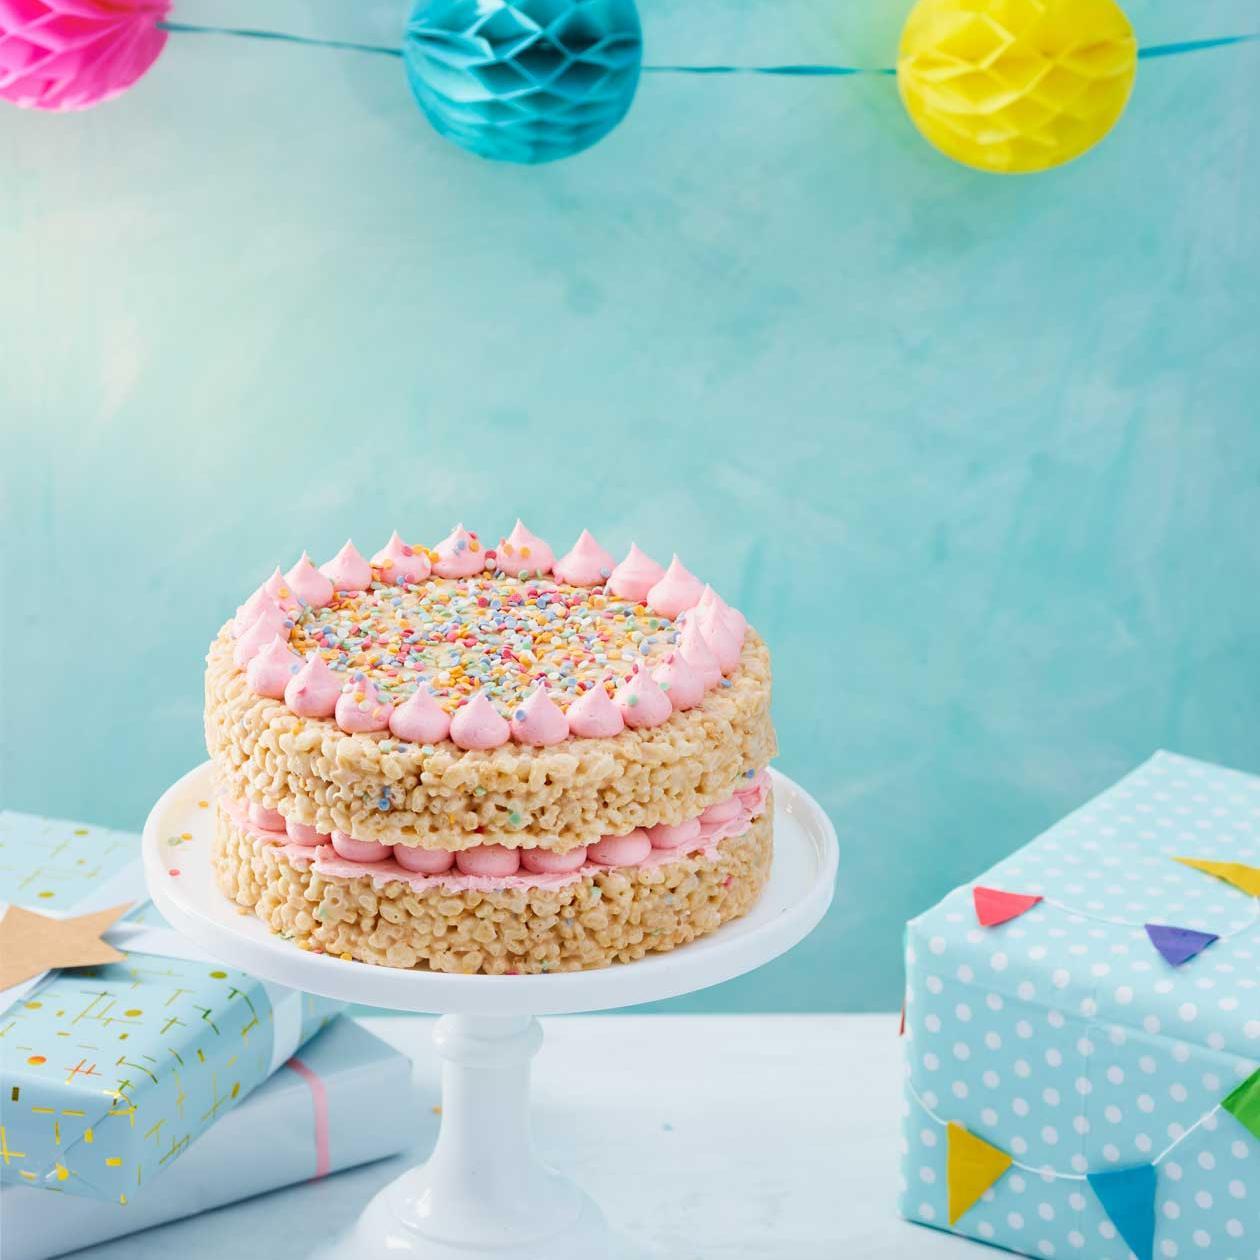 Awe Inspiring Rice Crispie Celebration Cake Recipe Sainsburys Magazine Funny Birthday Cards Online Fluifree Goldxyz